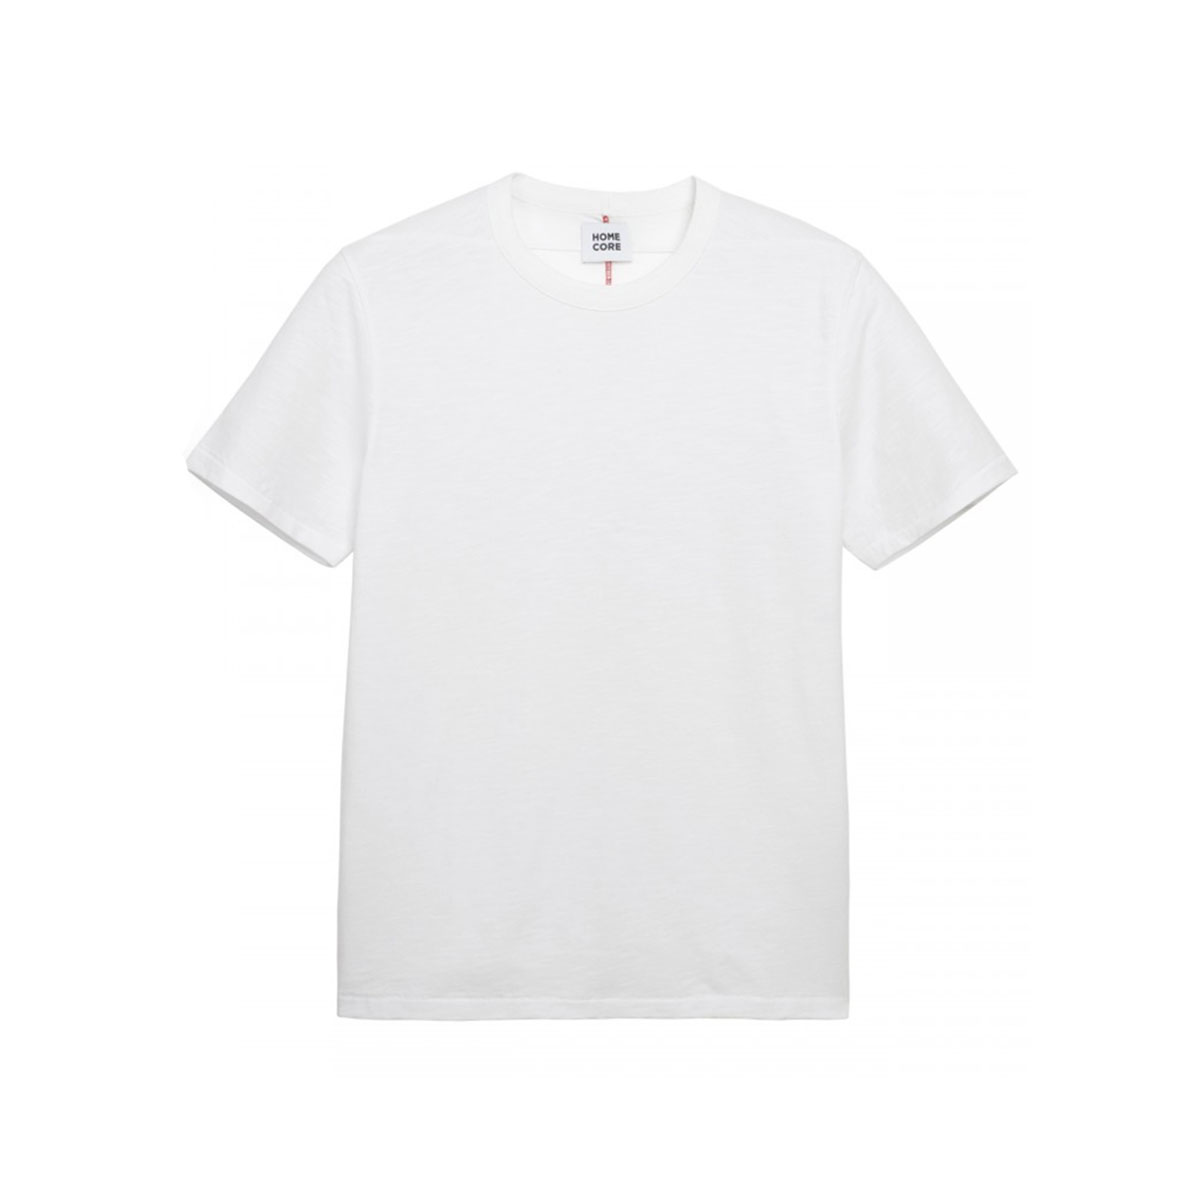 HOMECORE Tee shirt RODGER BIO White